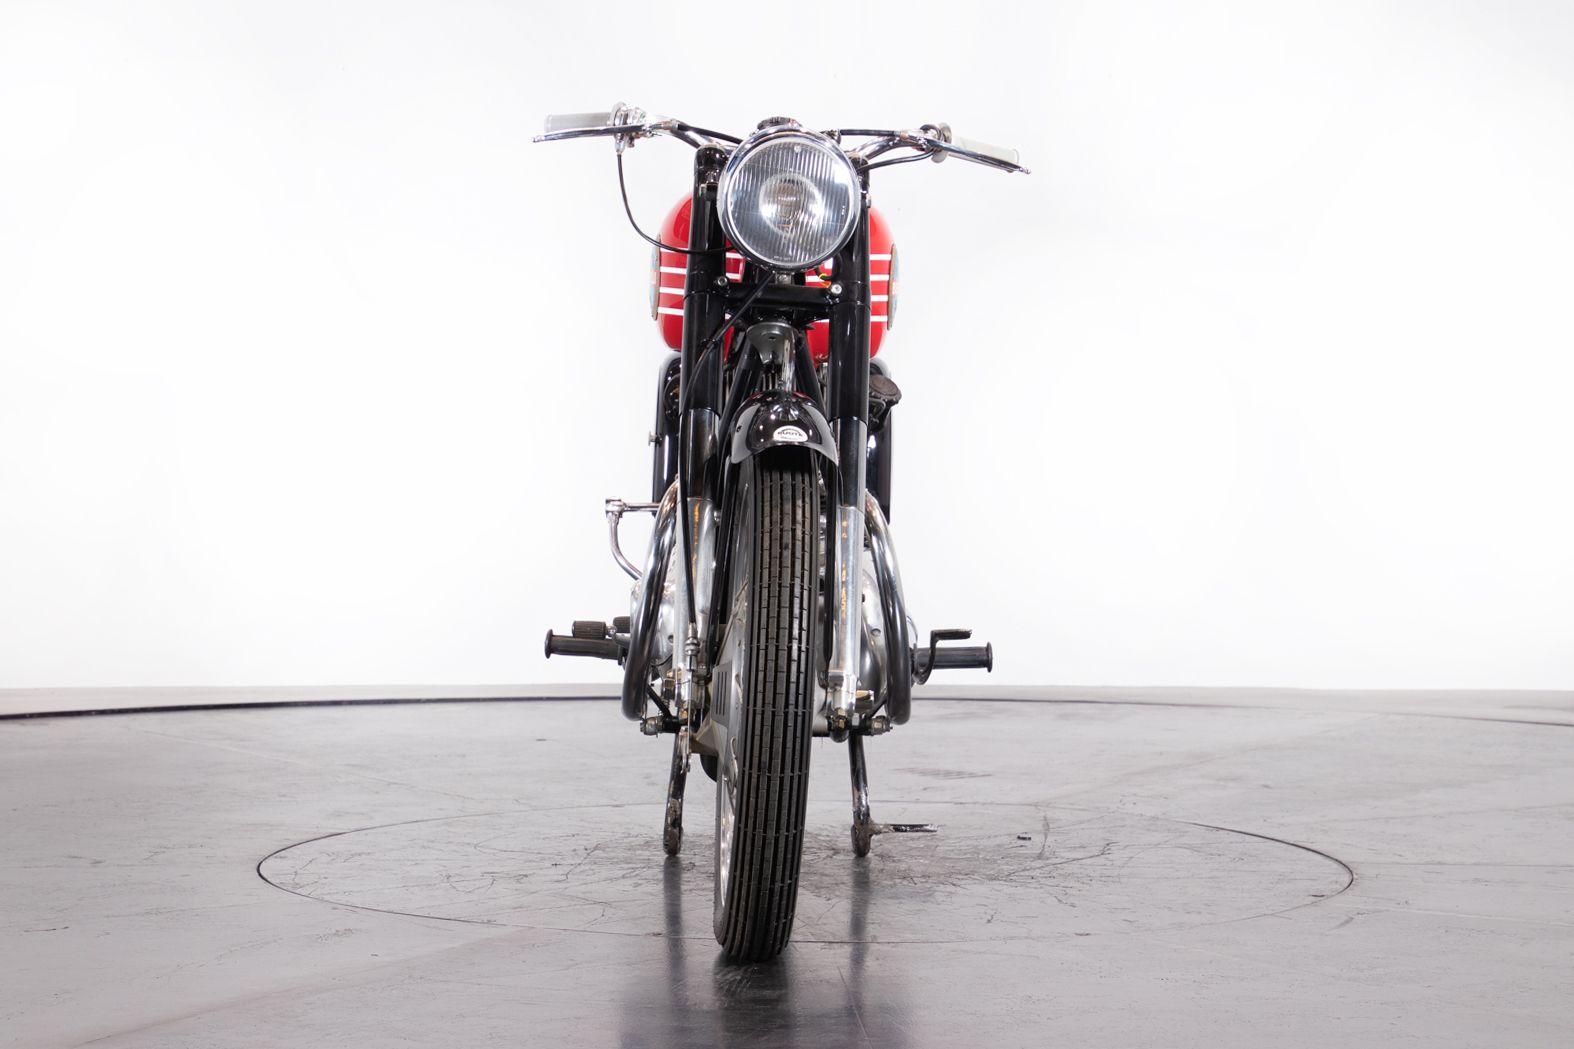 1955 Benelli 250 Leonessa 74310